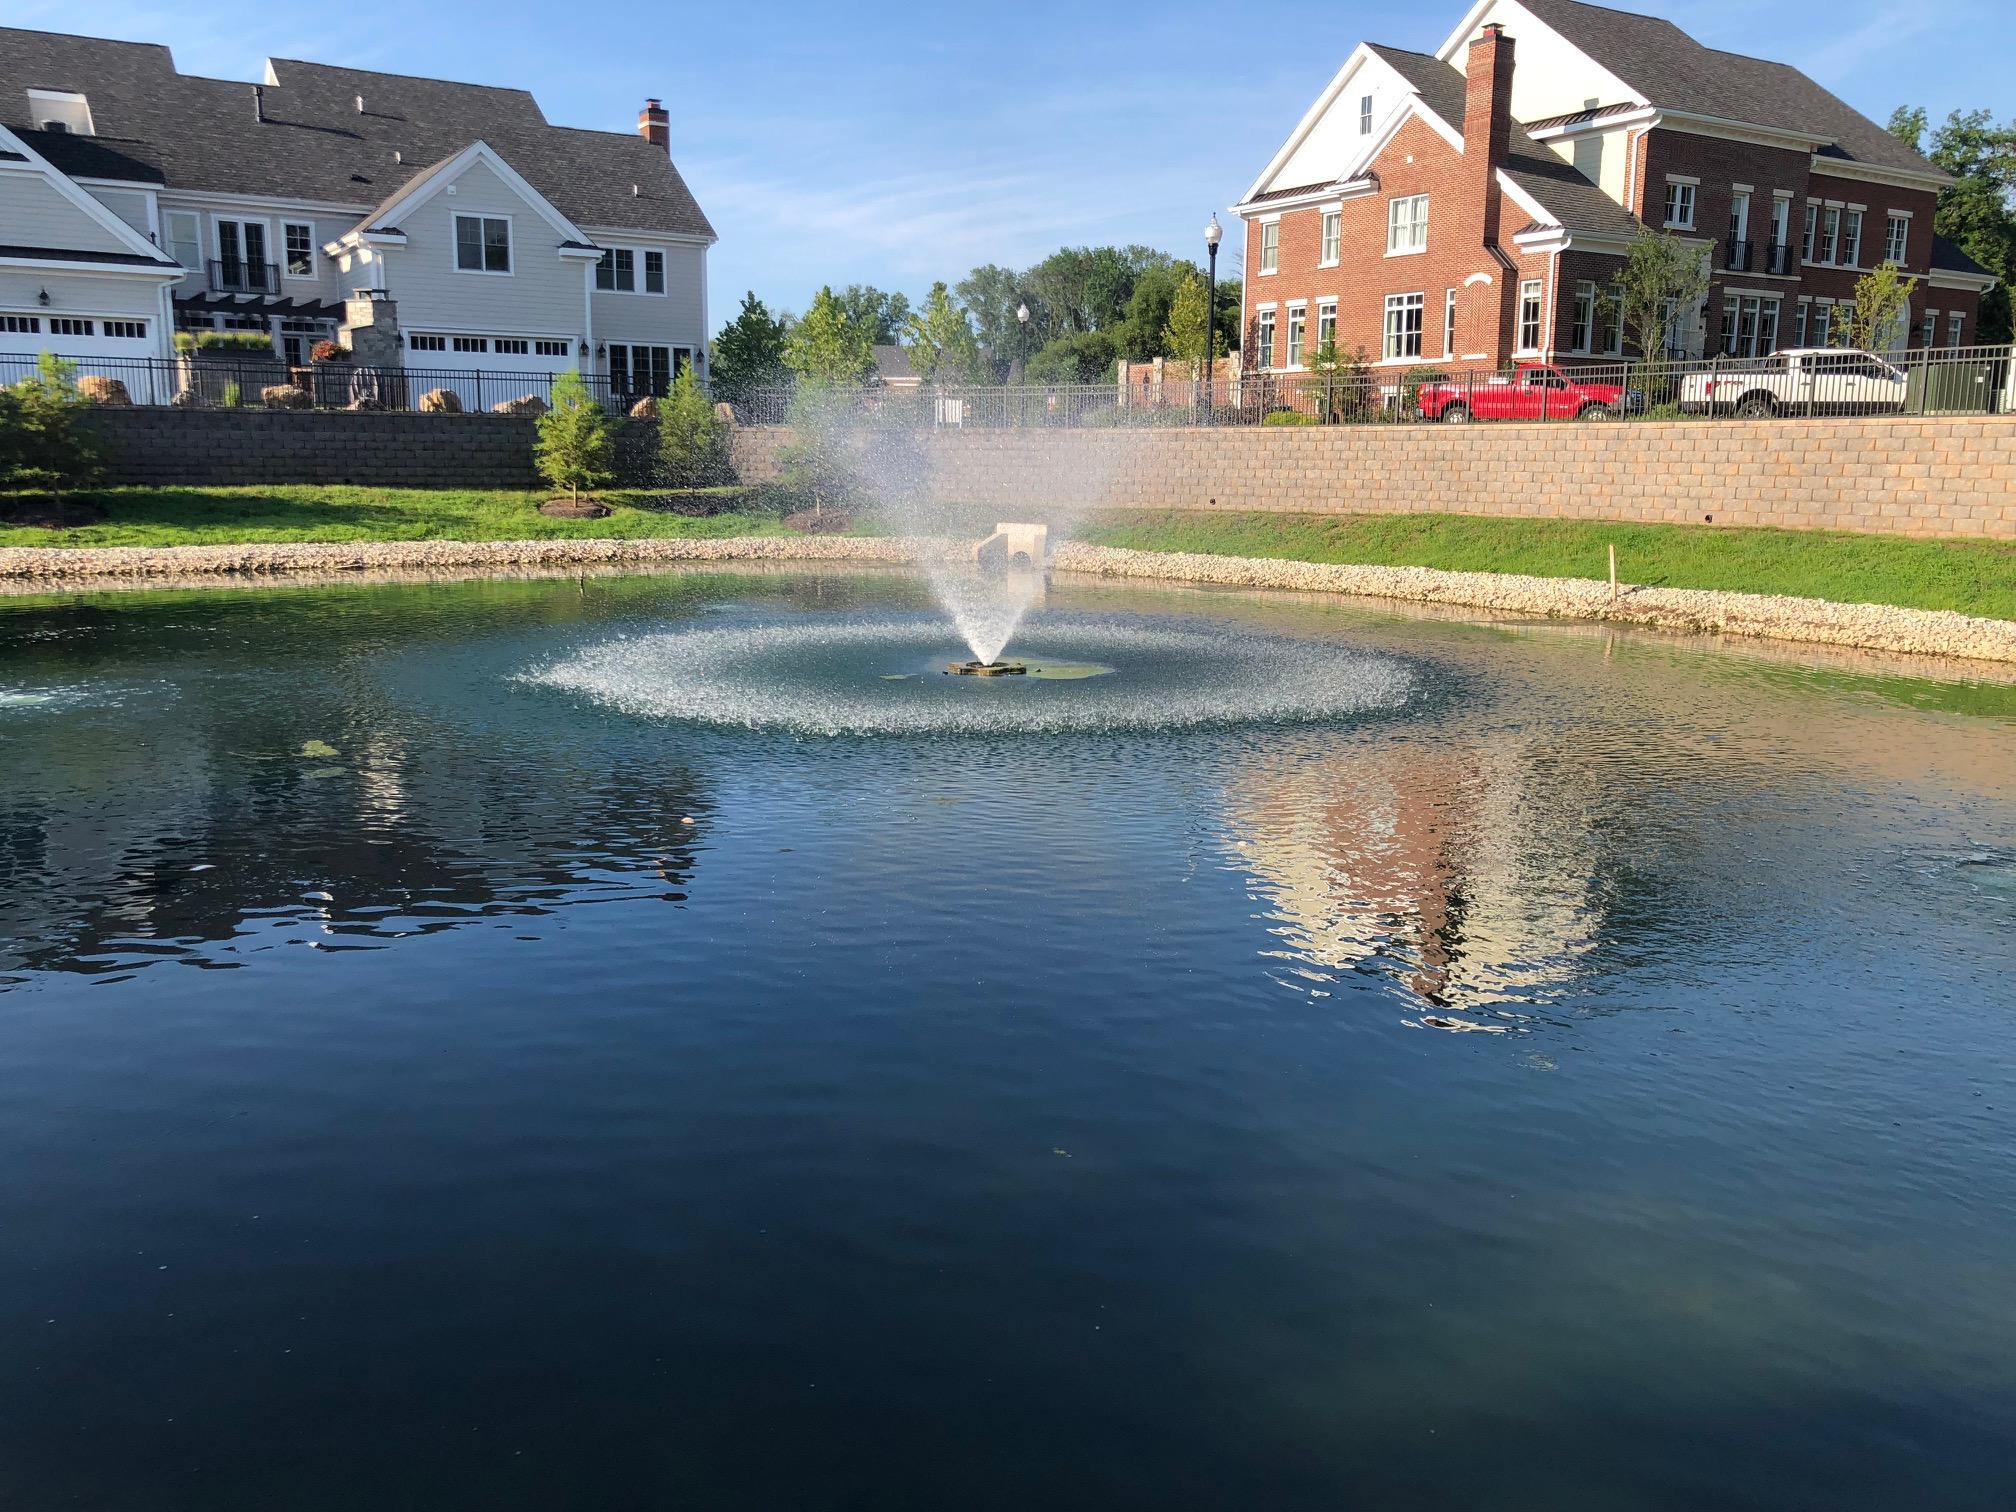 nice-hoa-pond-kasco-water-foutain-hydro-logic-aquasplash-blue-pond-dye-aqua-link.jpg